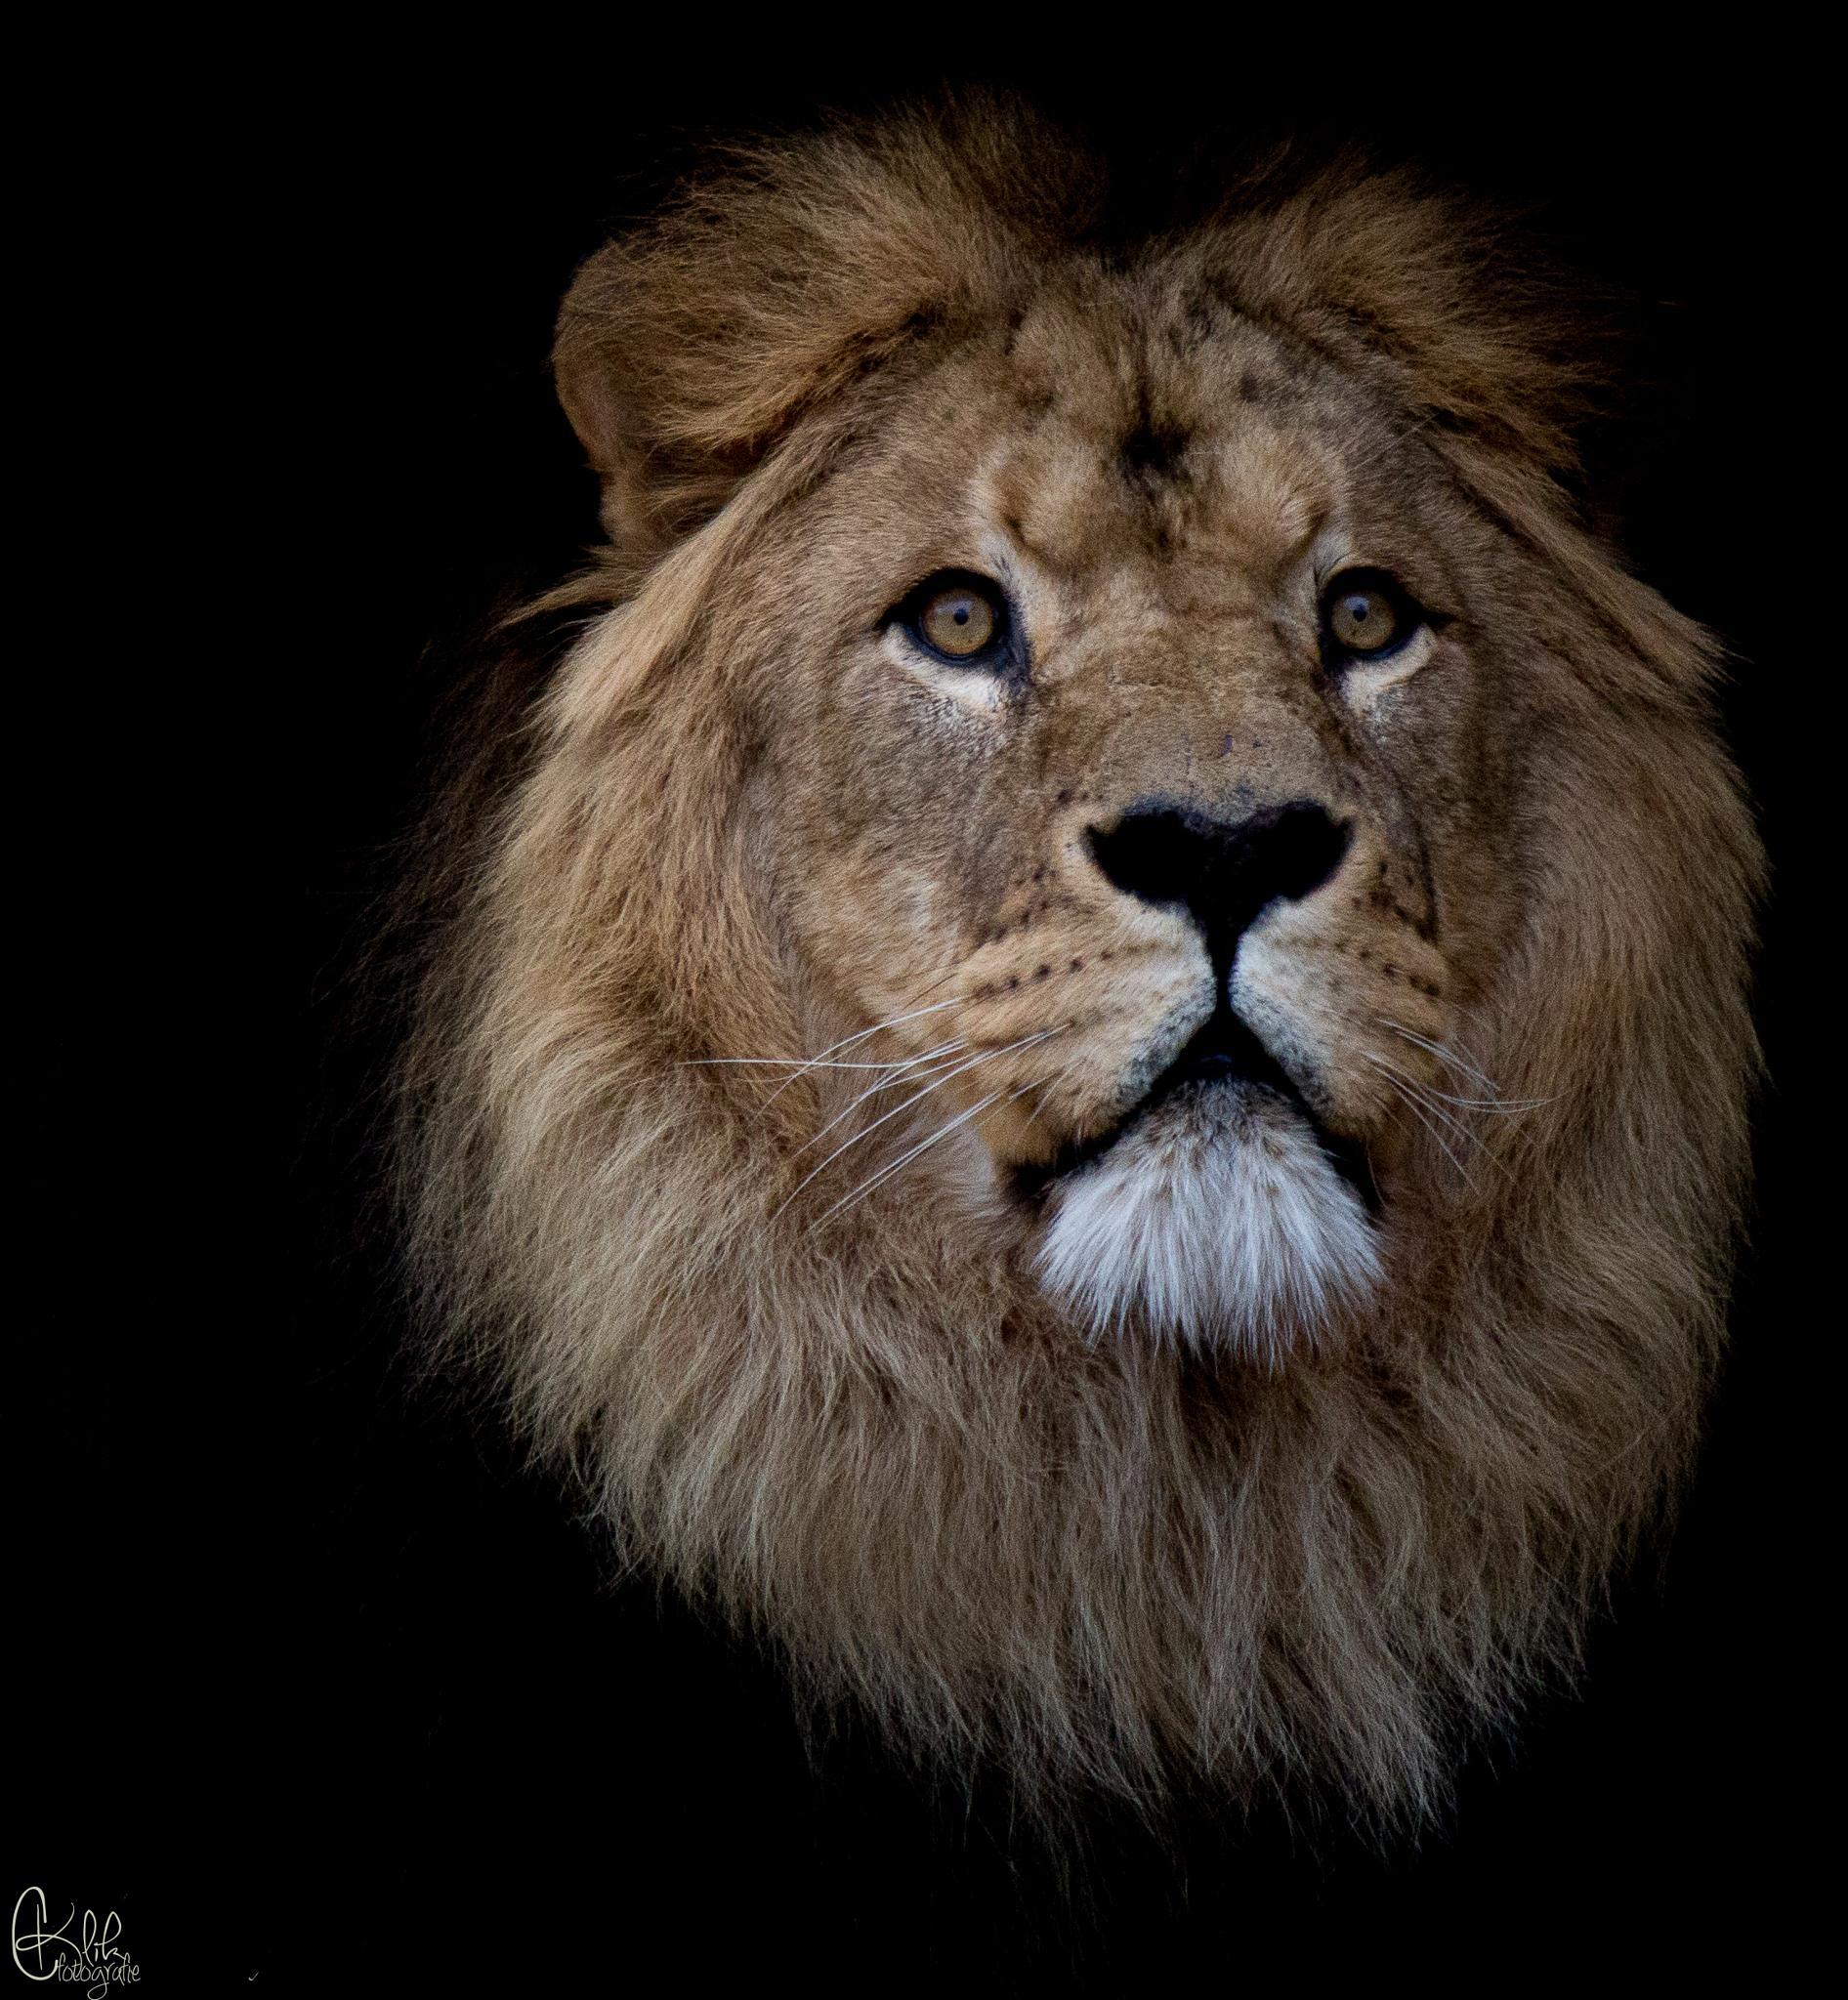 Lion King by Cklikfotografie